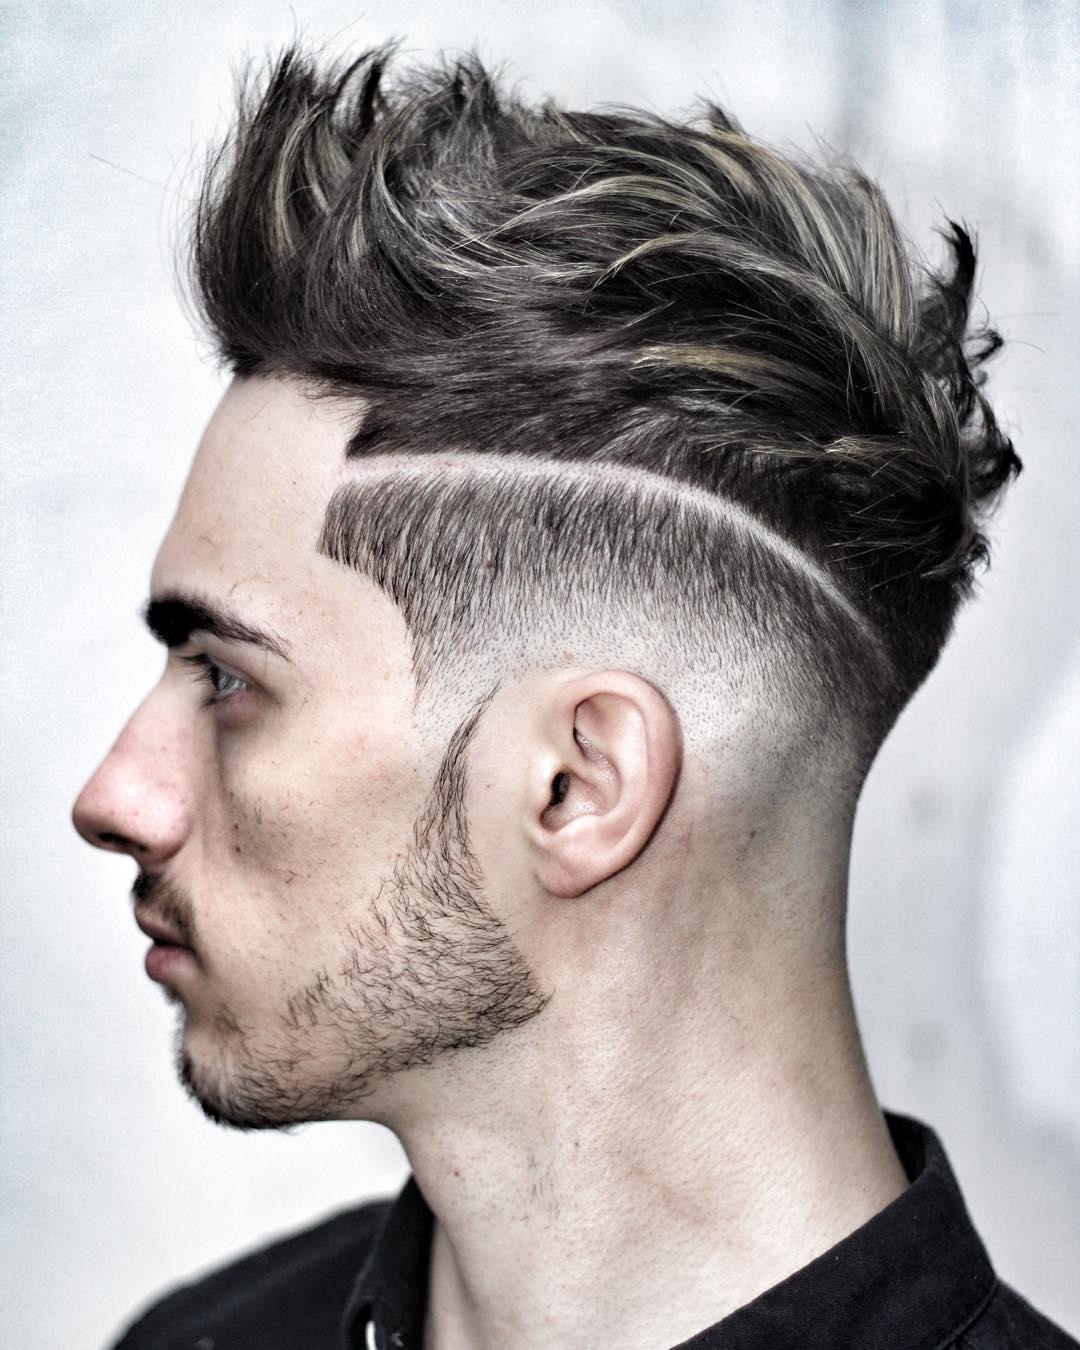 Sensational Hairstyle Images Boy 2016 Best Hairstyles 2017 Short Hairstyles Gunalazisus